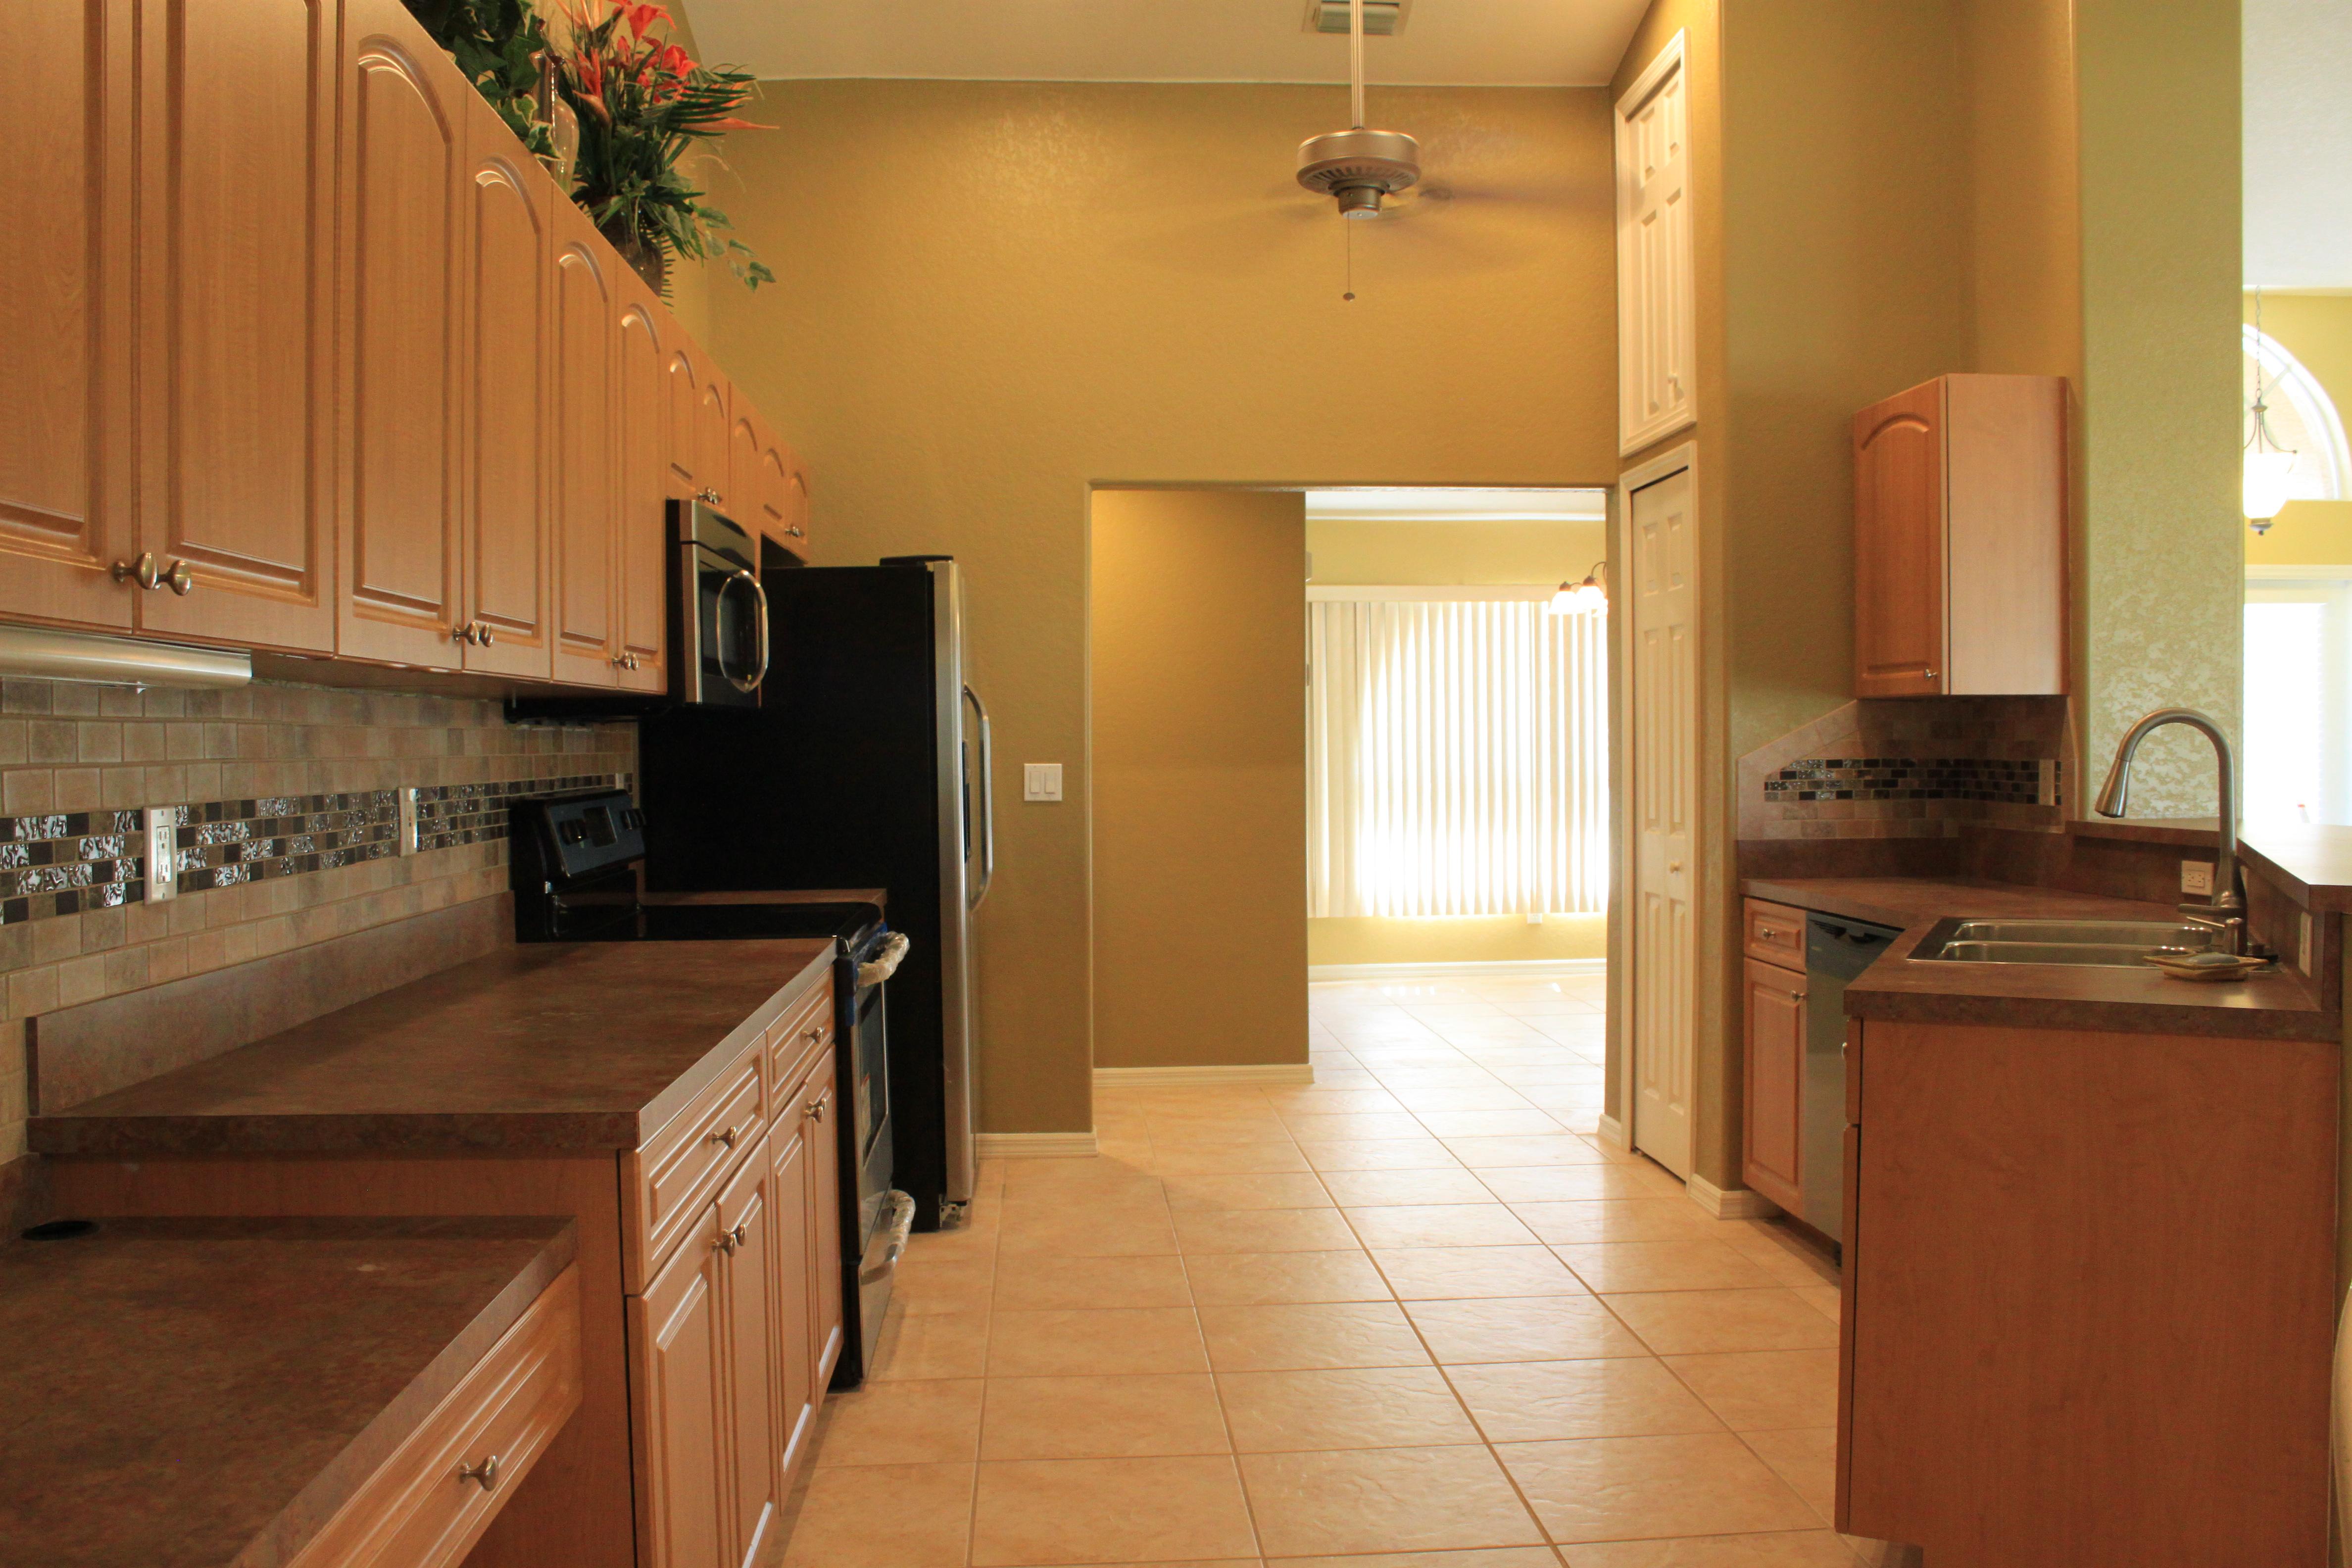 2327 SW 22nd St. Cape Coral, FL 33991 -Kitchen view 2